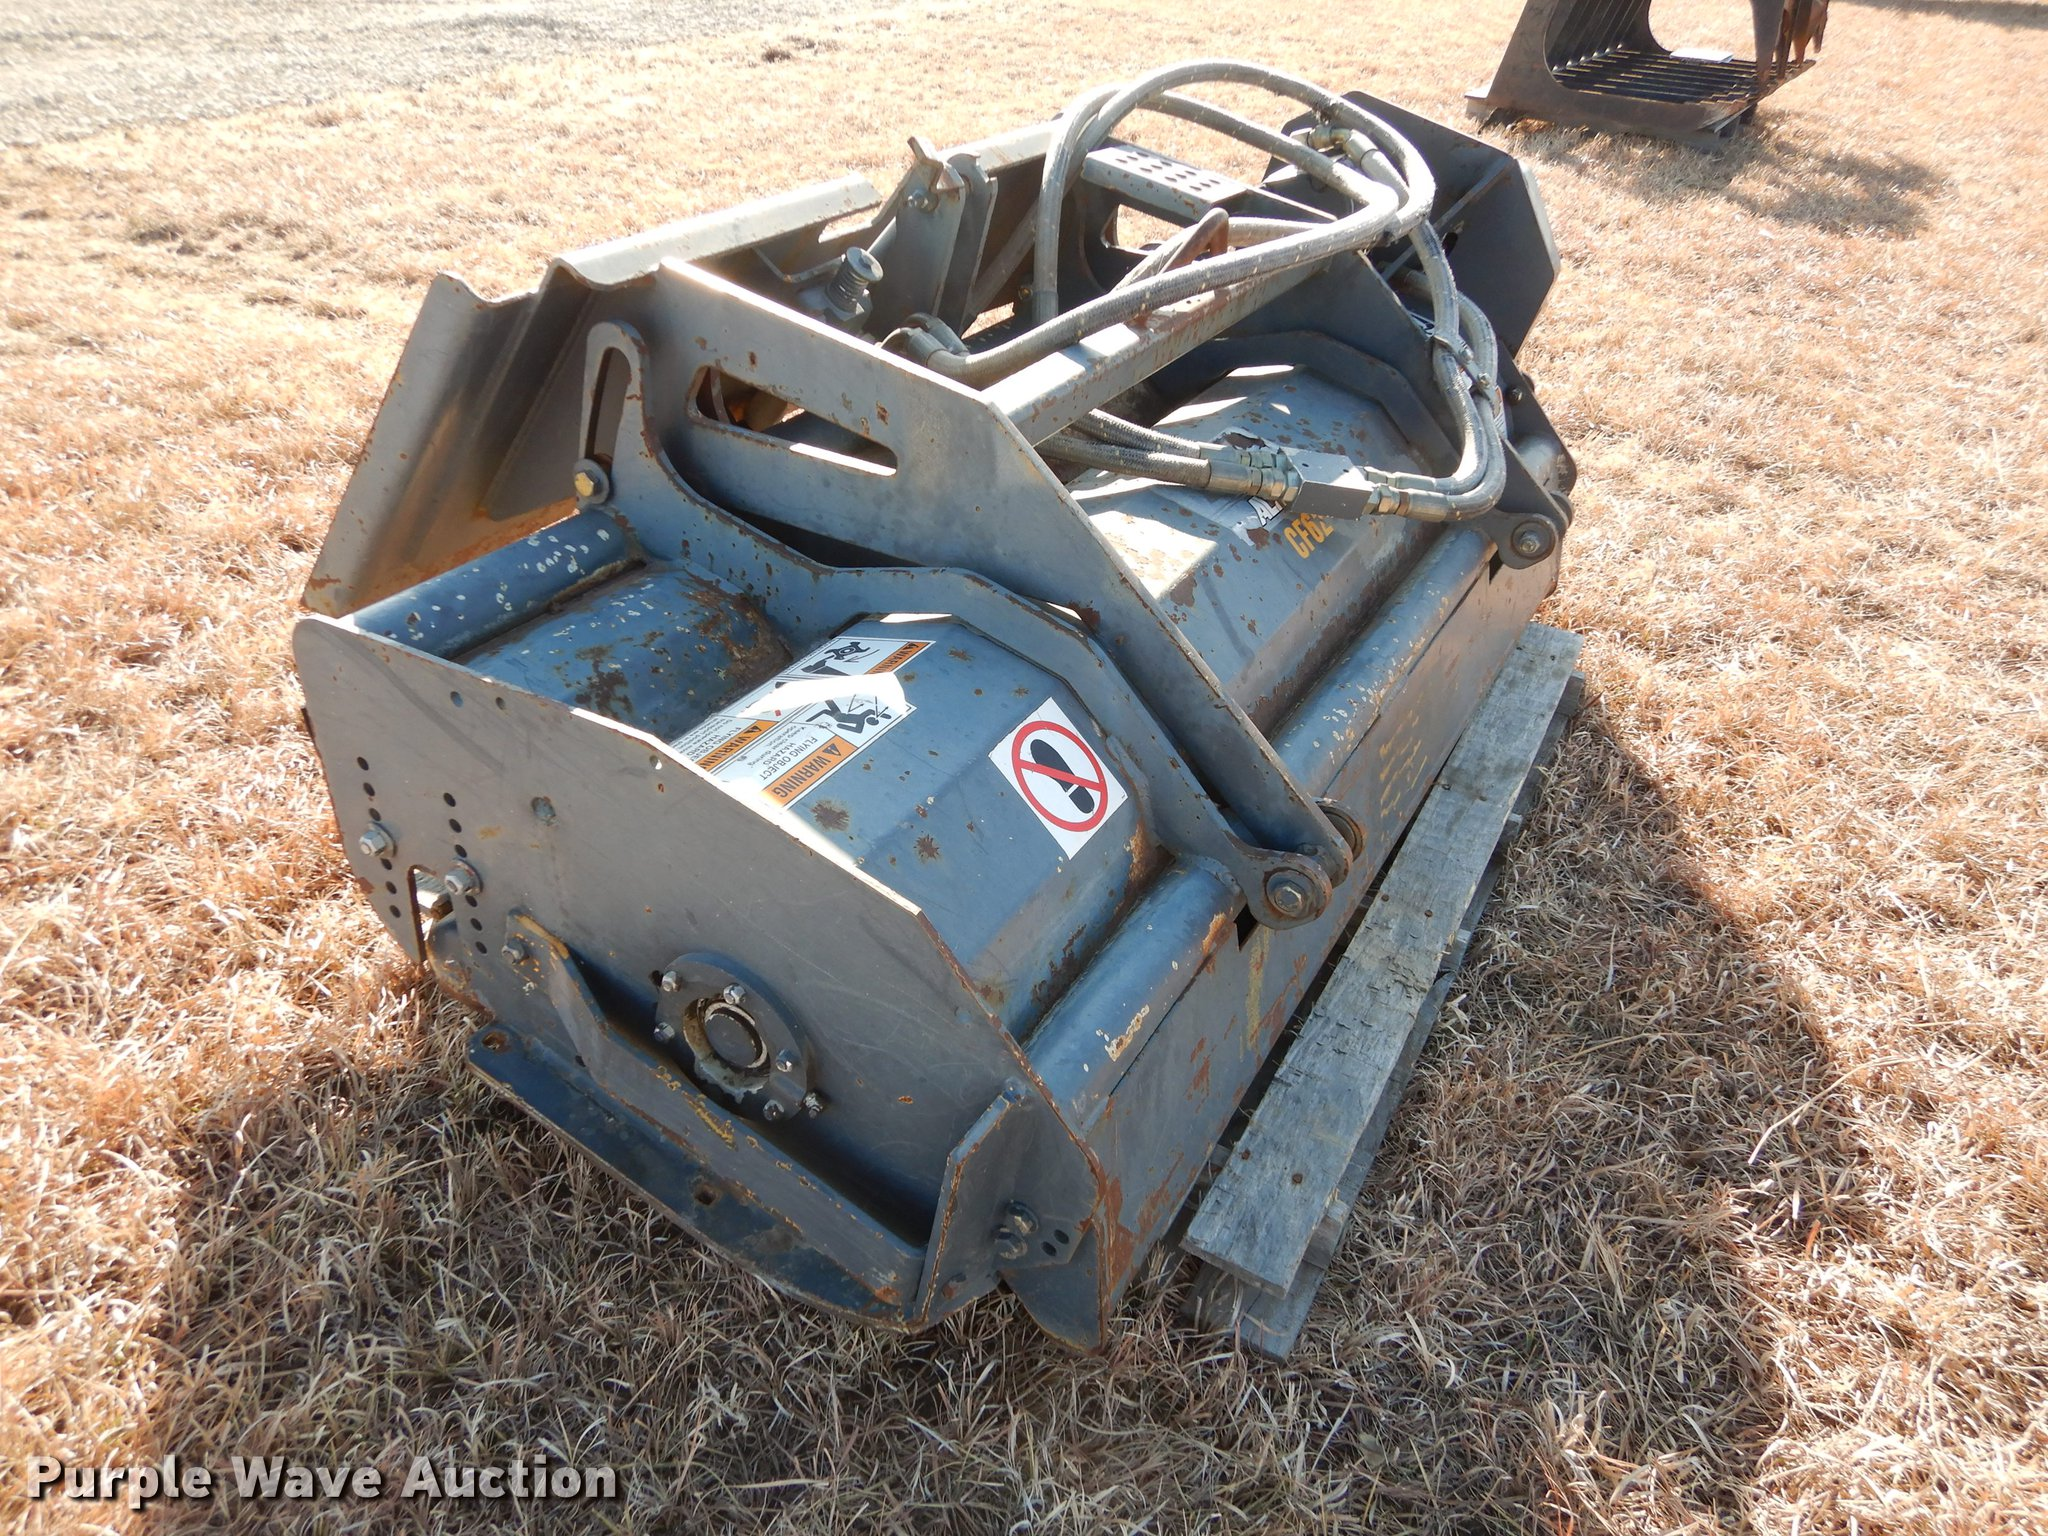 Case Alitec skid steer flail mower   Item DC0342   SOLD! Apr